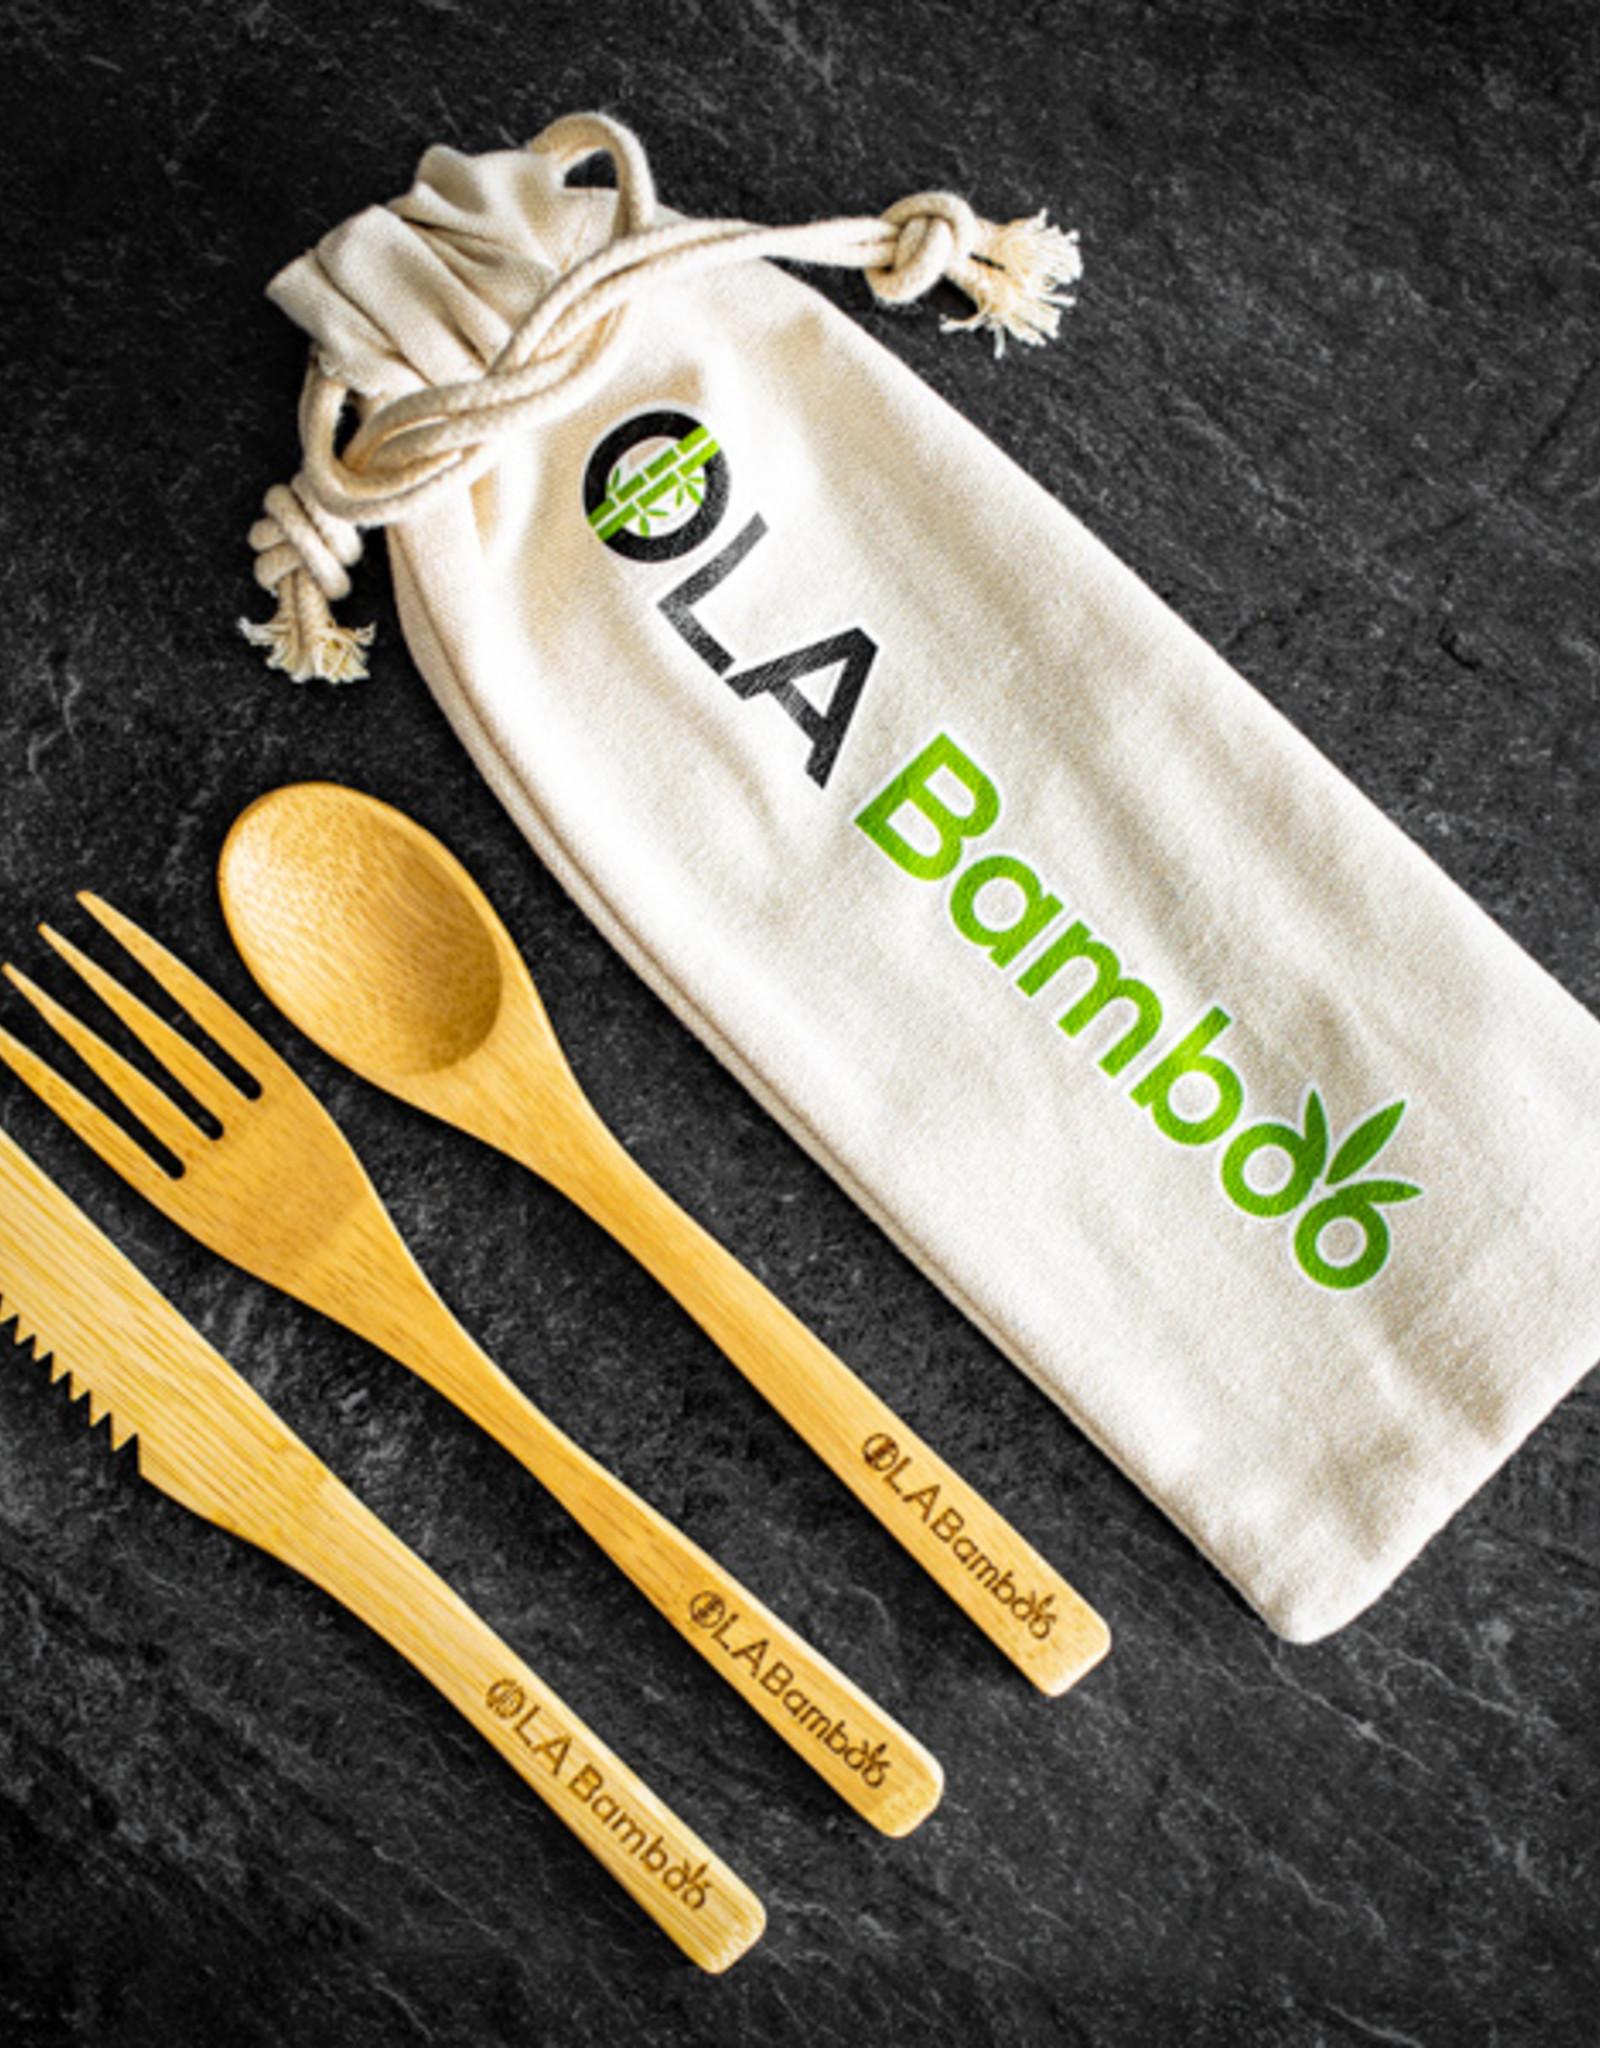 Ustensiles en bamboo réutilisables